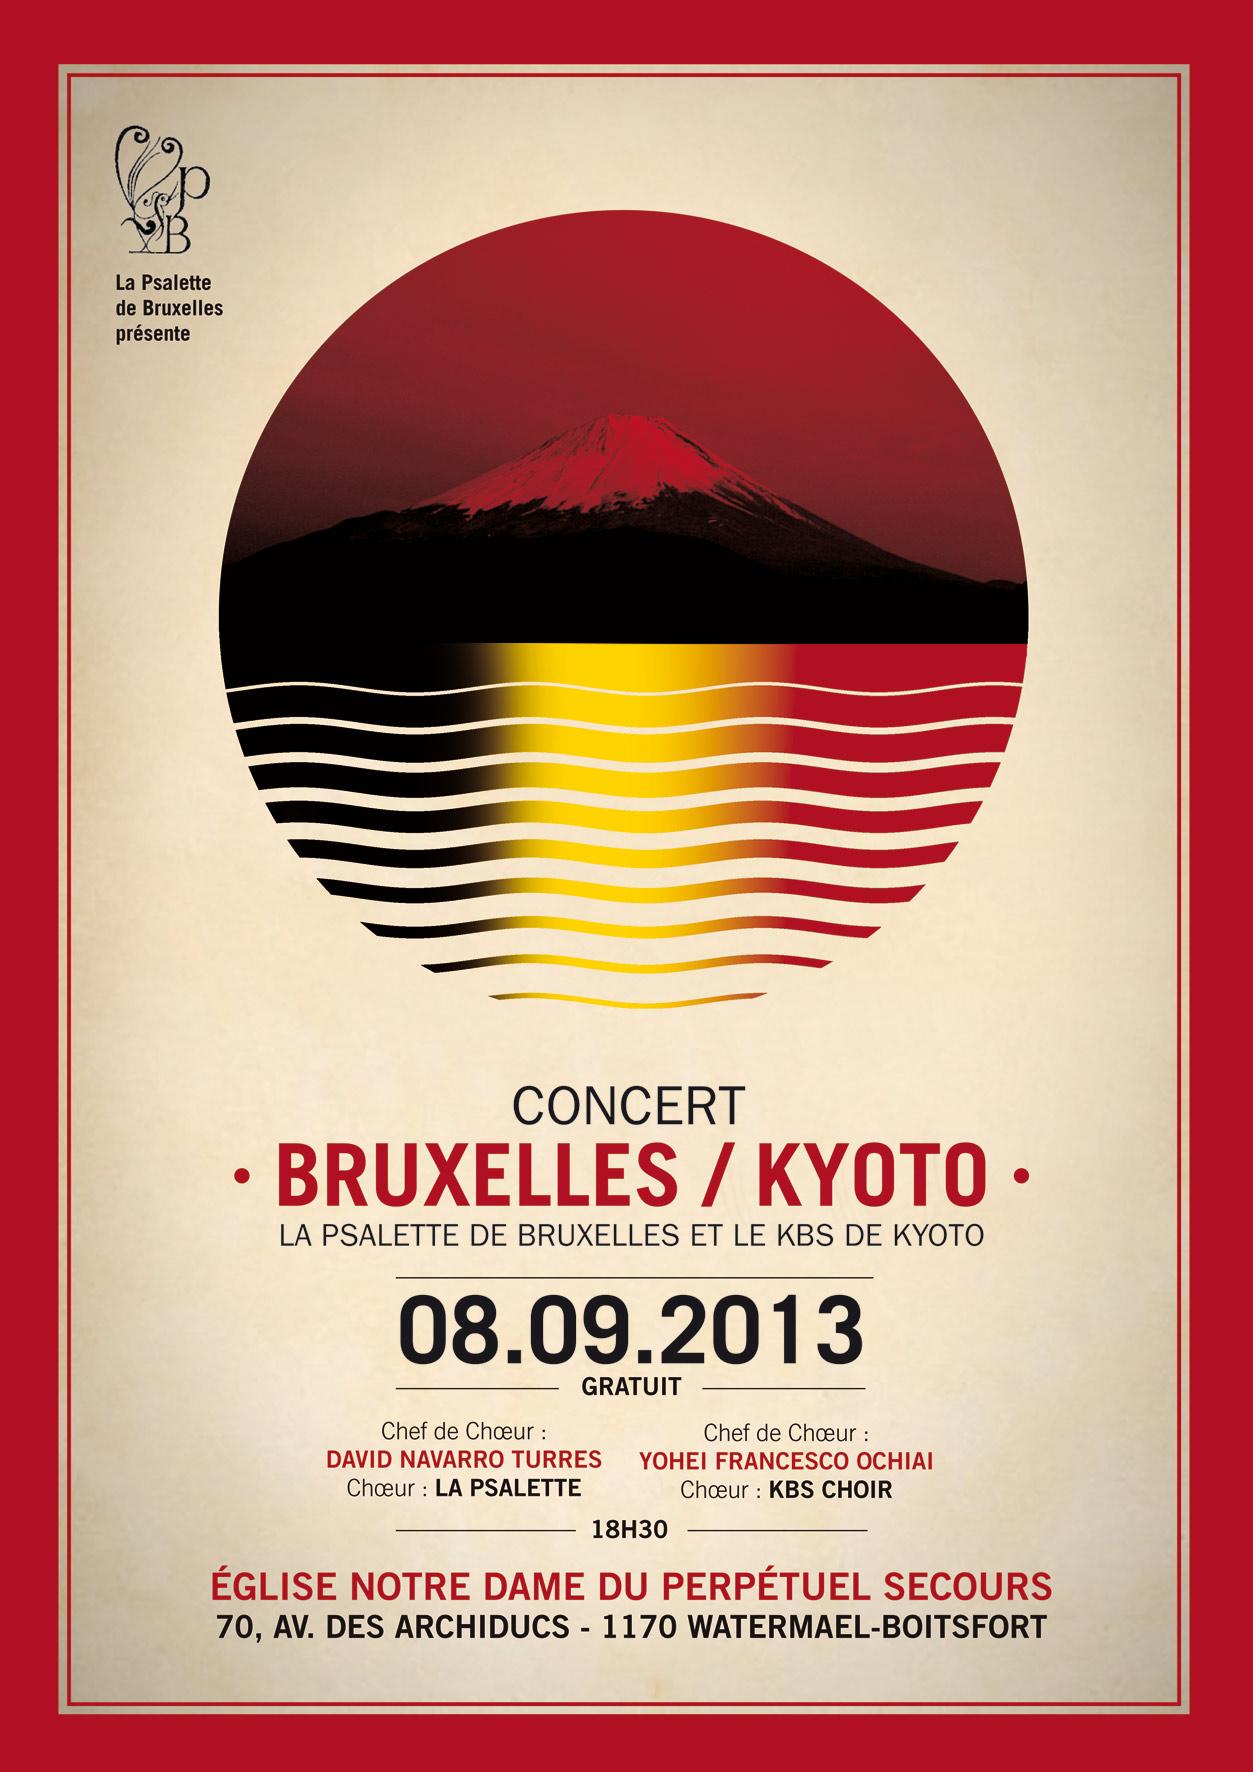 9月8日(日)18:30 ベルギー・日本の合同演奏会 入場無料_d0217479_16323595.jpg